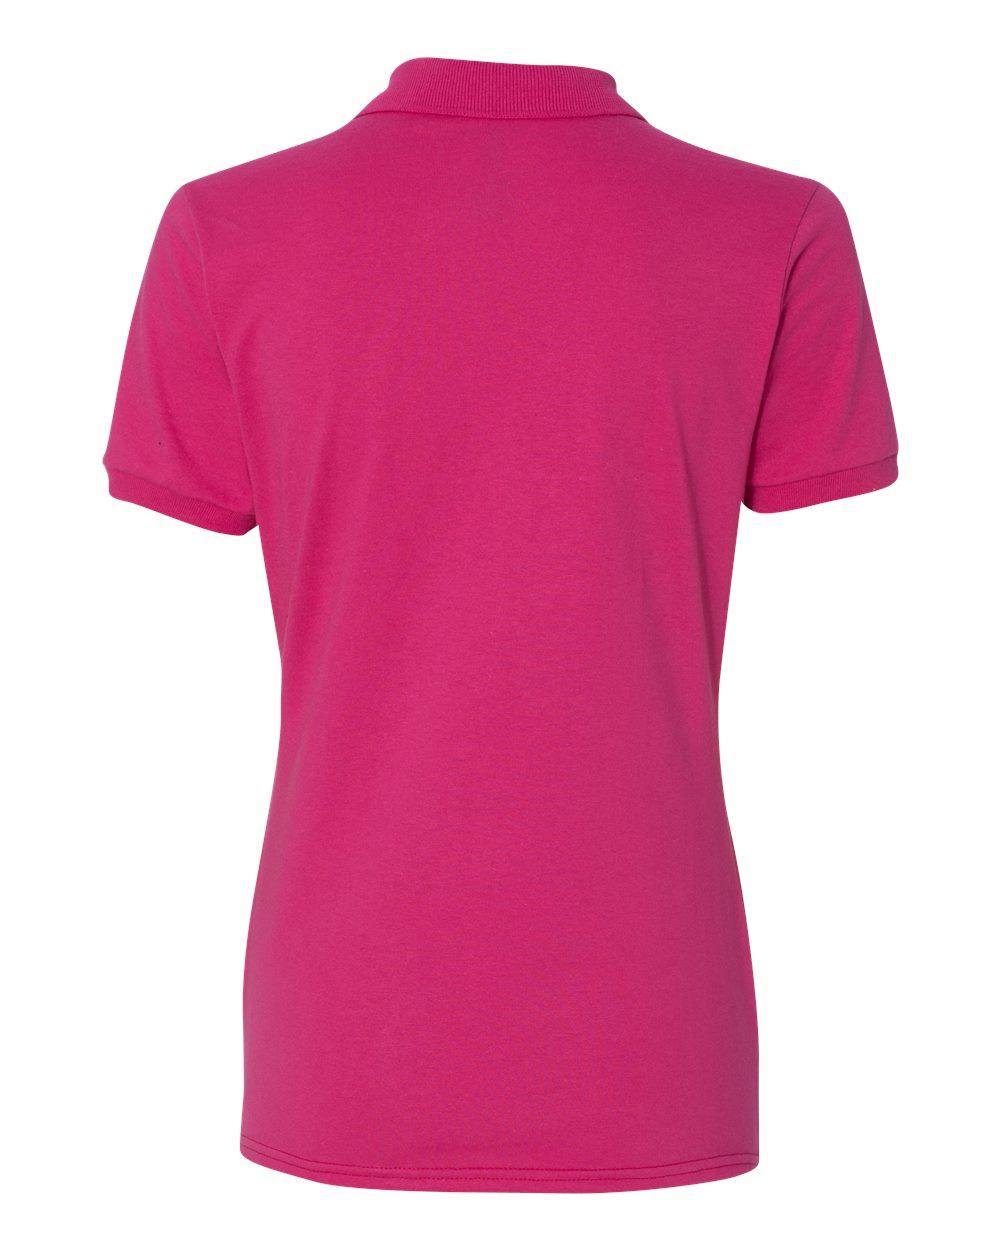 Jerzees-Womens-5-6-oz-50-50-Jersey-Polo-with-Spot-Shield-437W-Size-S-2XL thumbnail 18